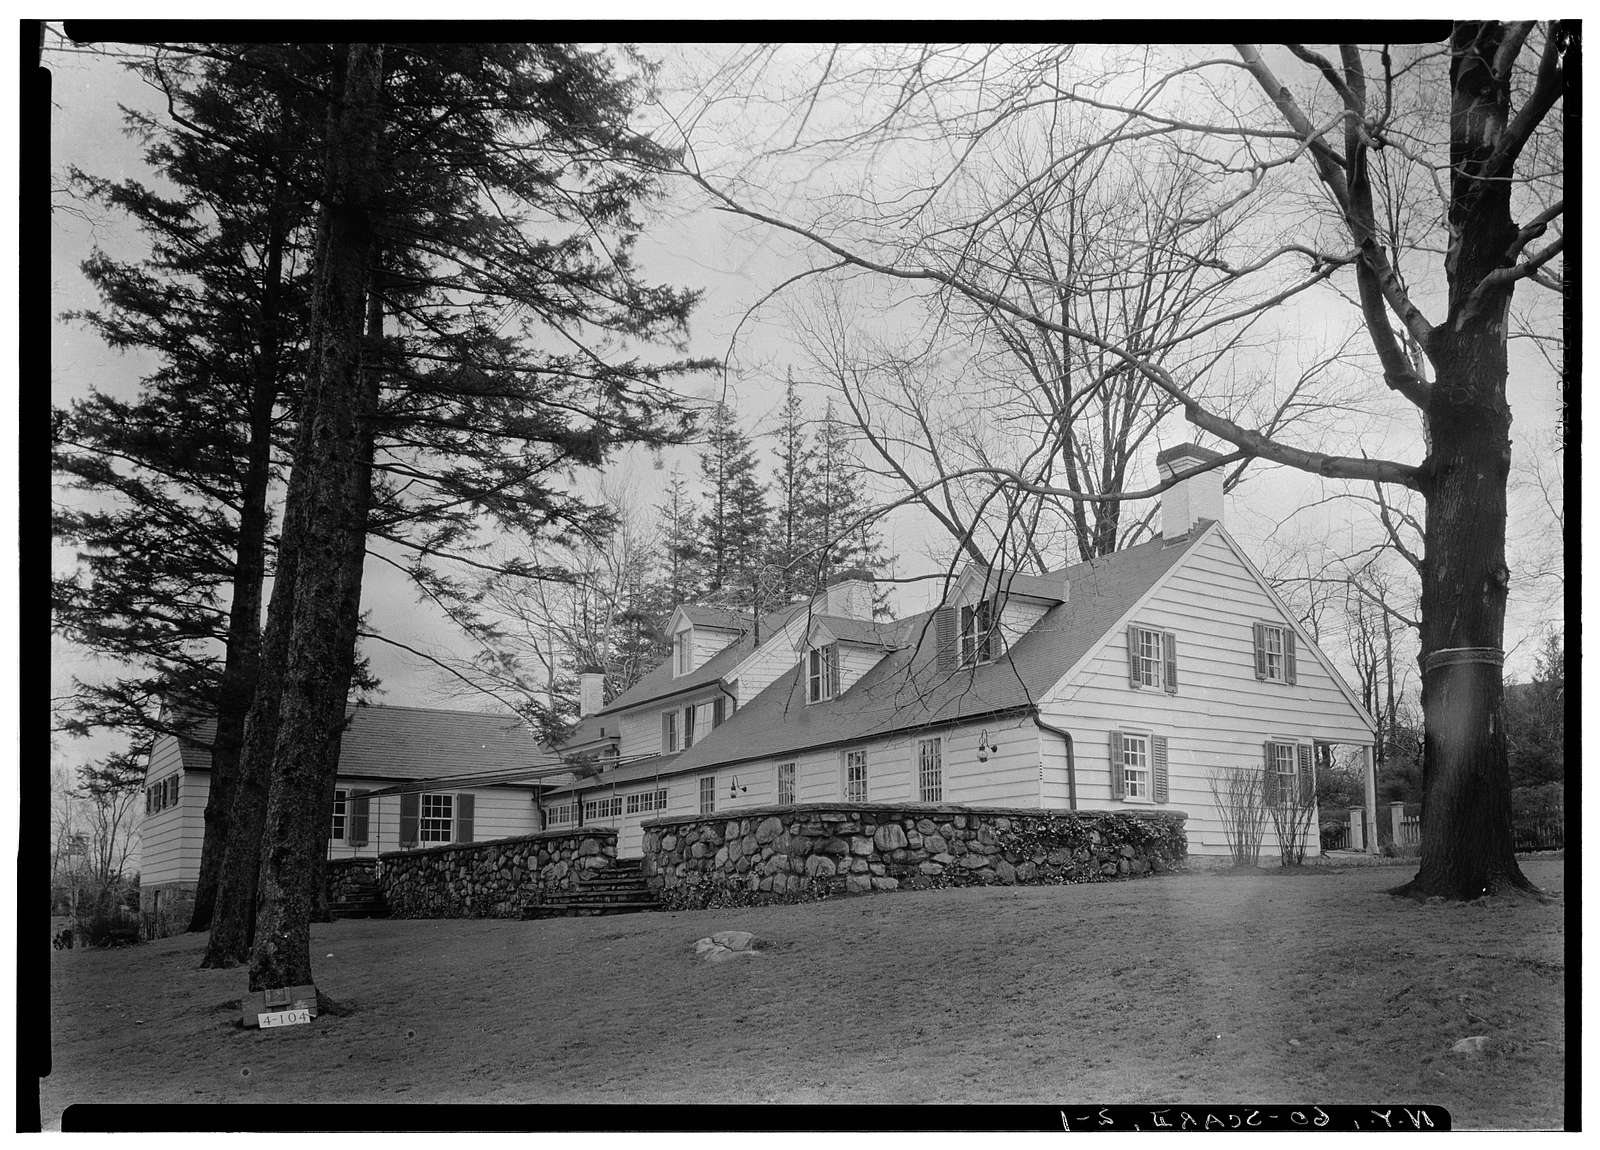 Wayside Inn, Post Road & Wayside Lane, Scarsdale, Westchester County, NY